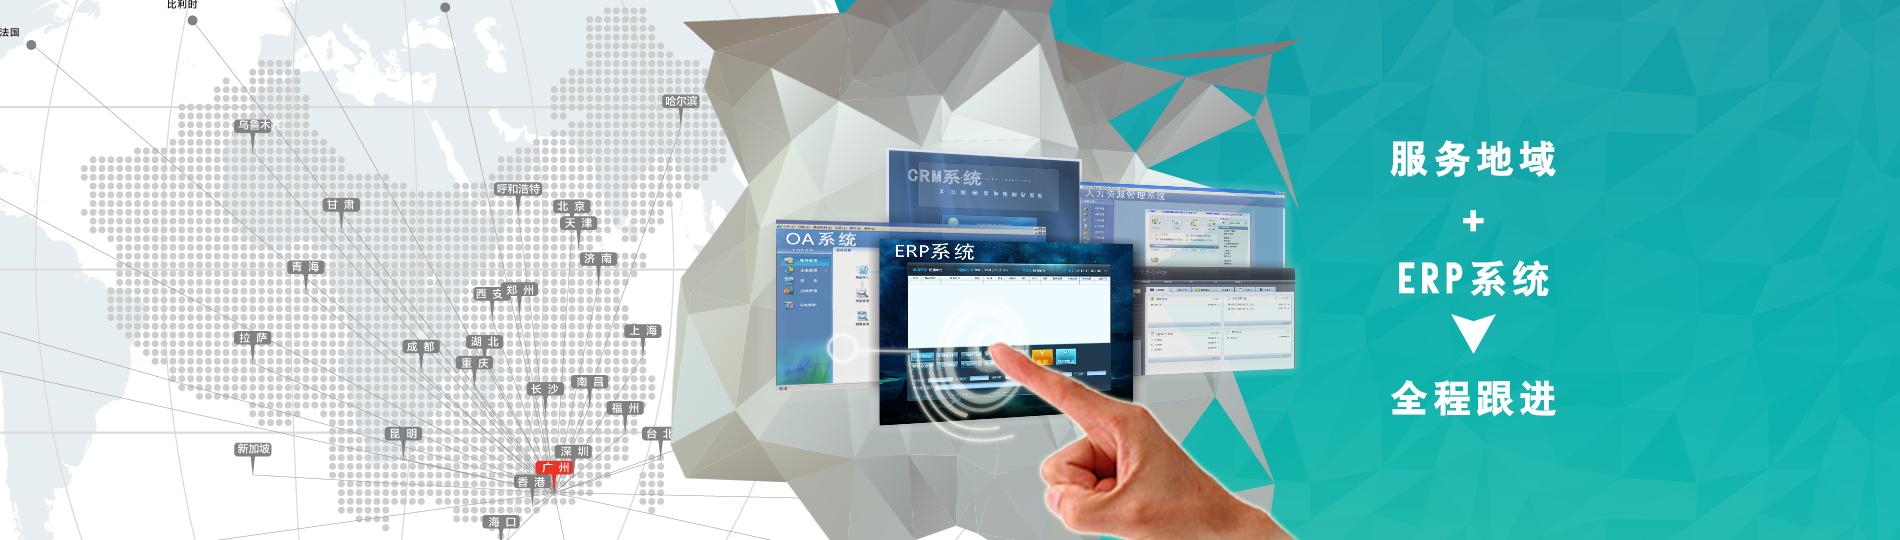 ERP系统管理 360度全程跟进